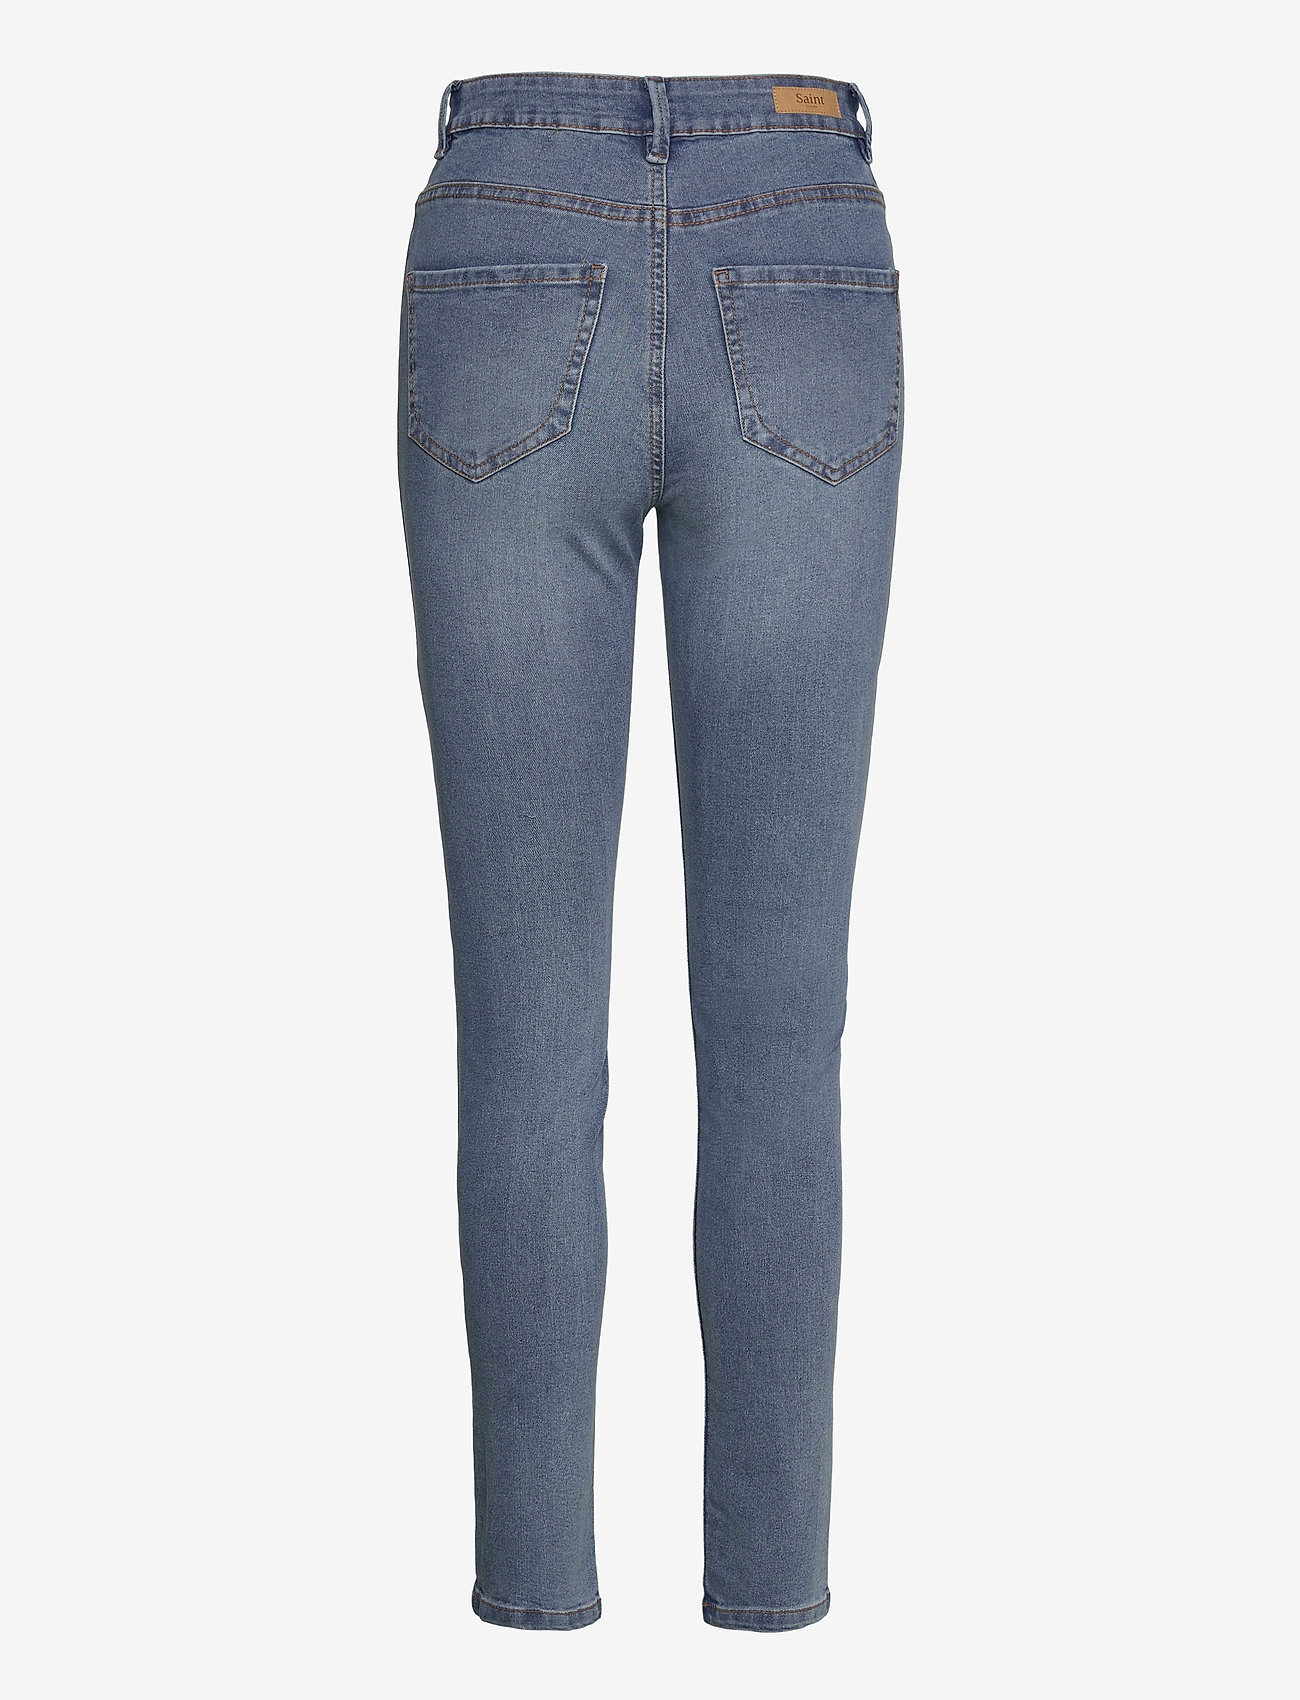 Saint Tropez - T5757, TinnaSZ Jeans - skinny jeans - light blue denim - 2